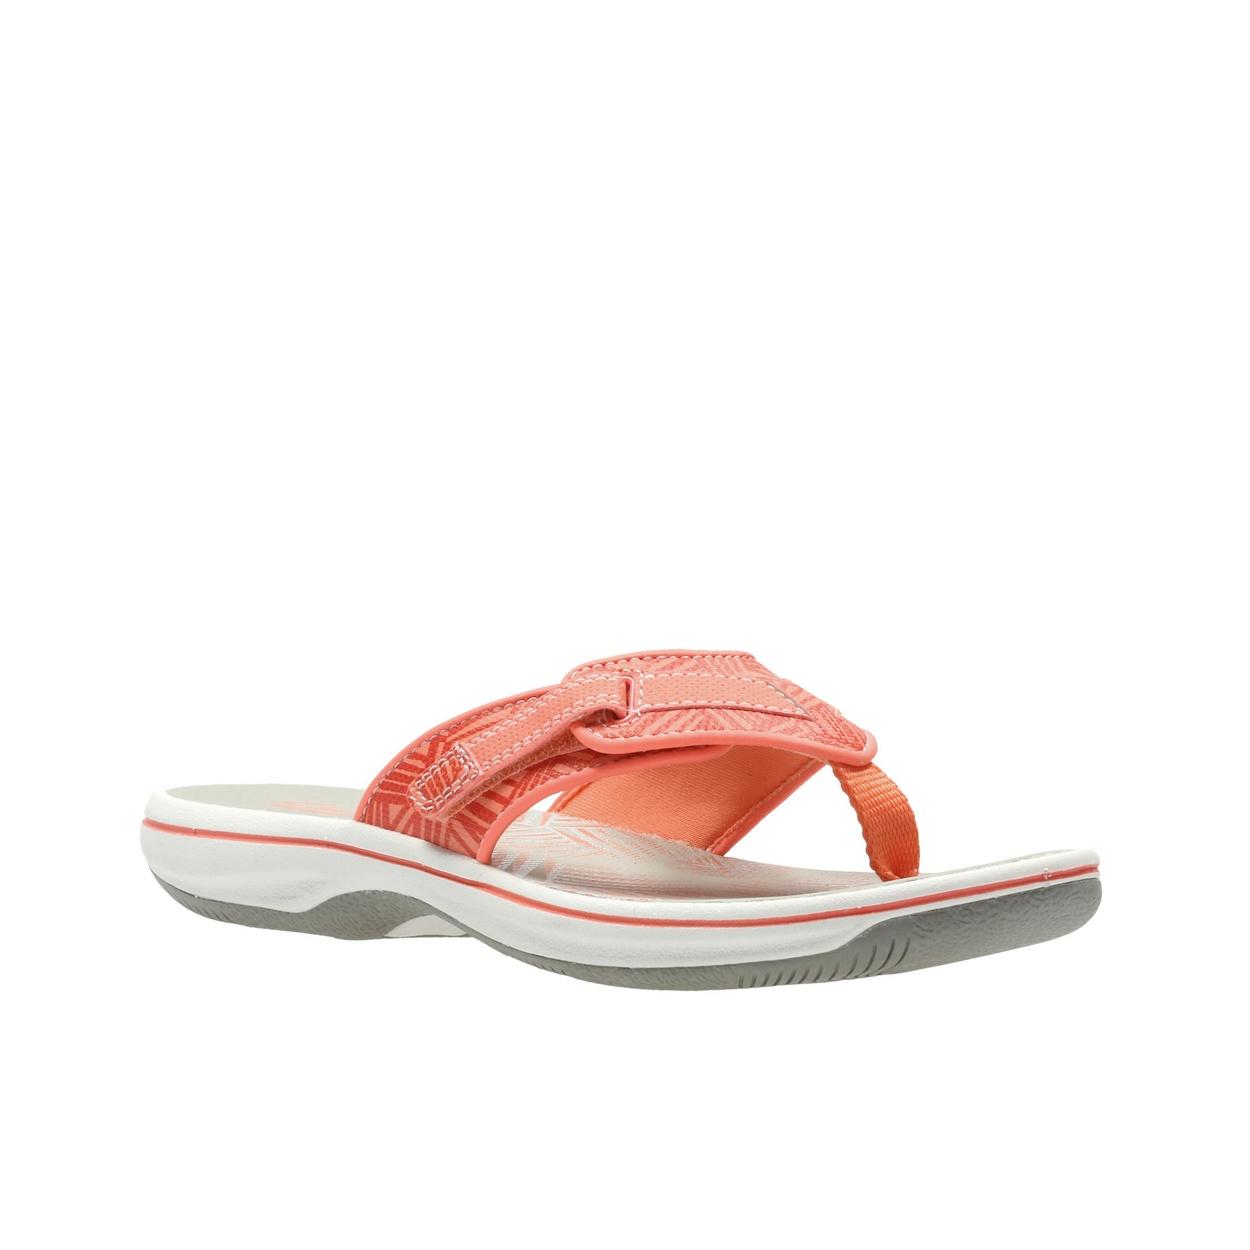 Women's sandals debenhams - Clarks Coral Brinkley Quade Sandals